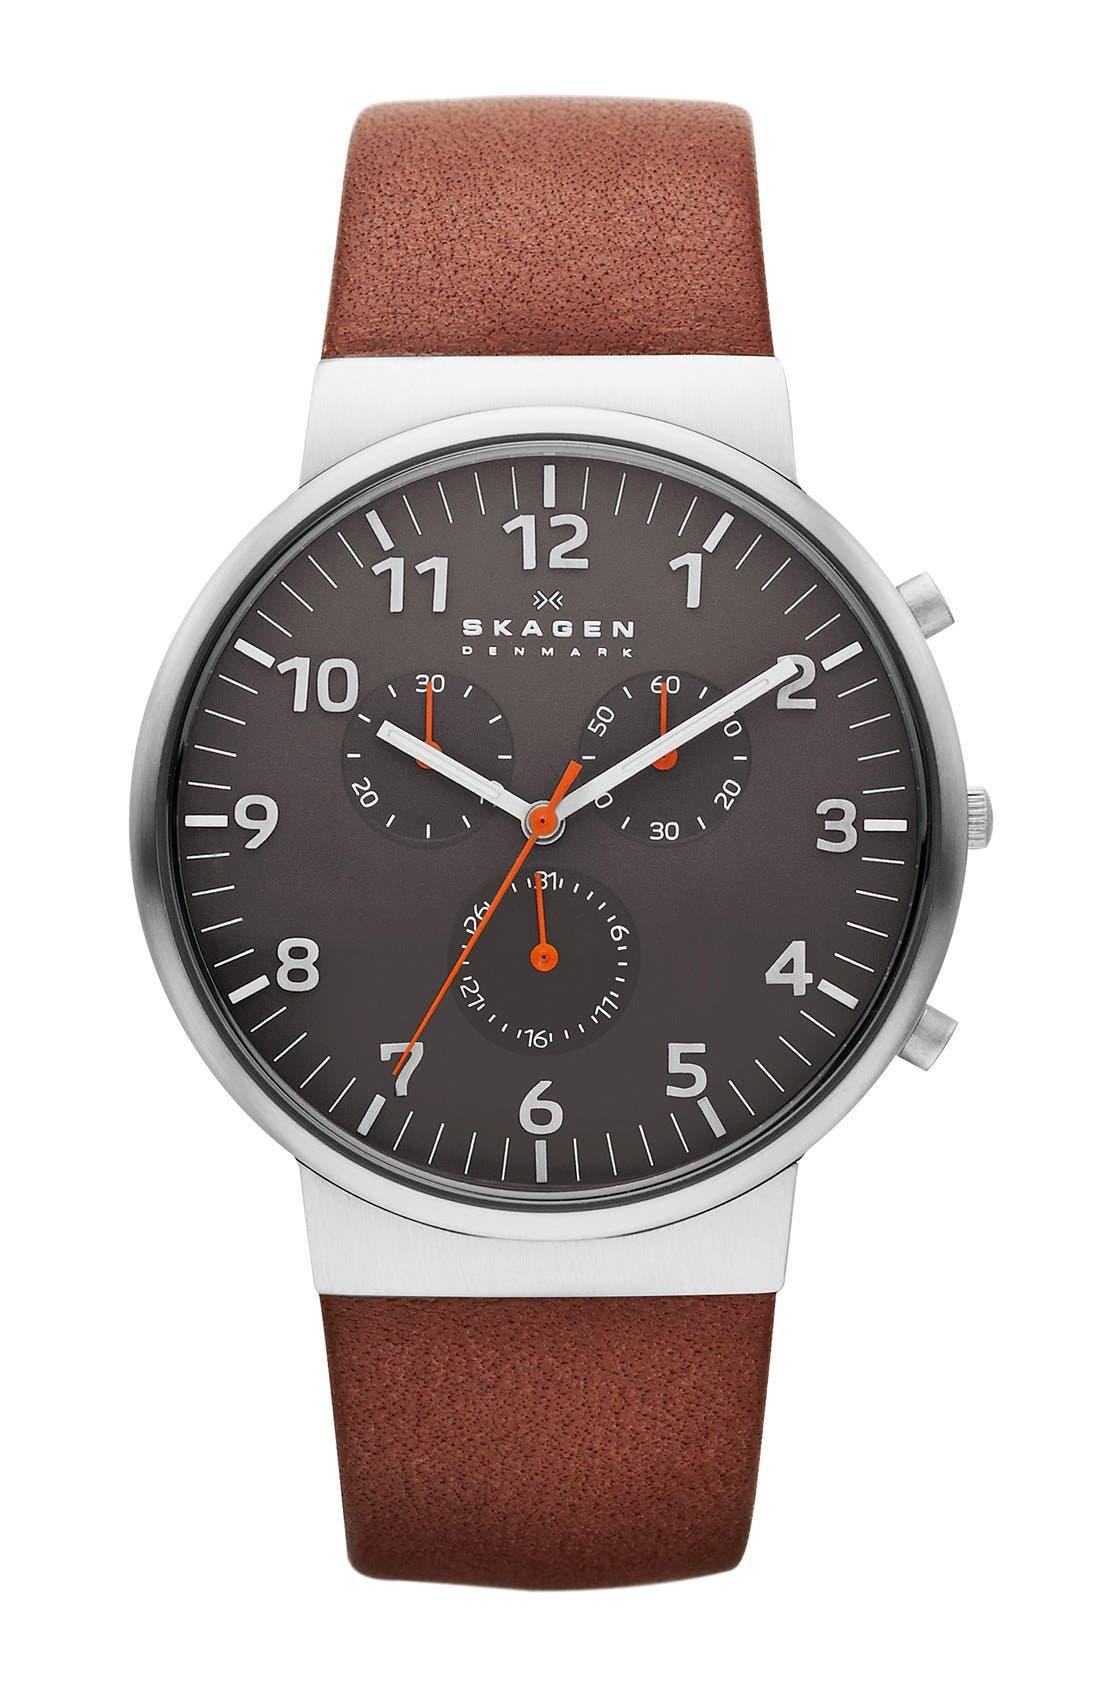 Main Image - Skagen 'Ancher' Round Chronograph Leather Strap Watch, 40mm